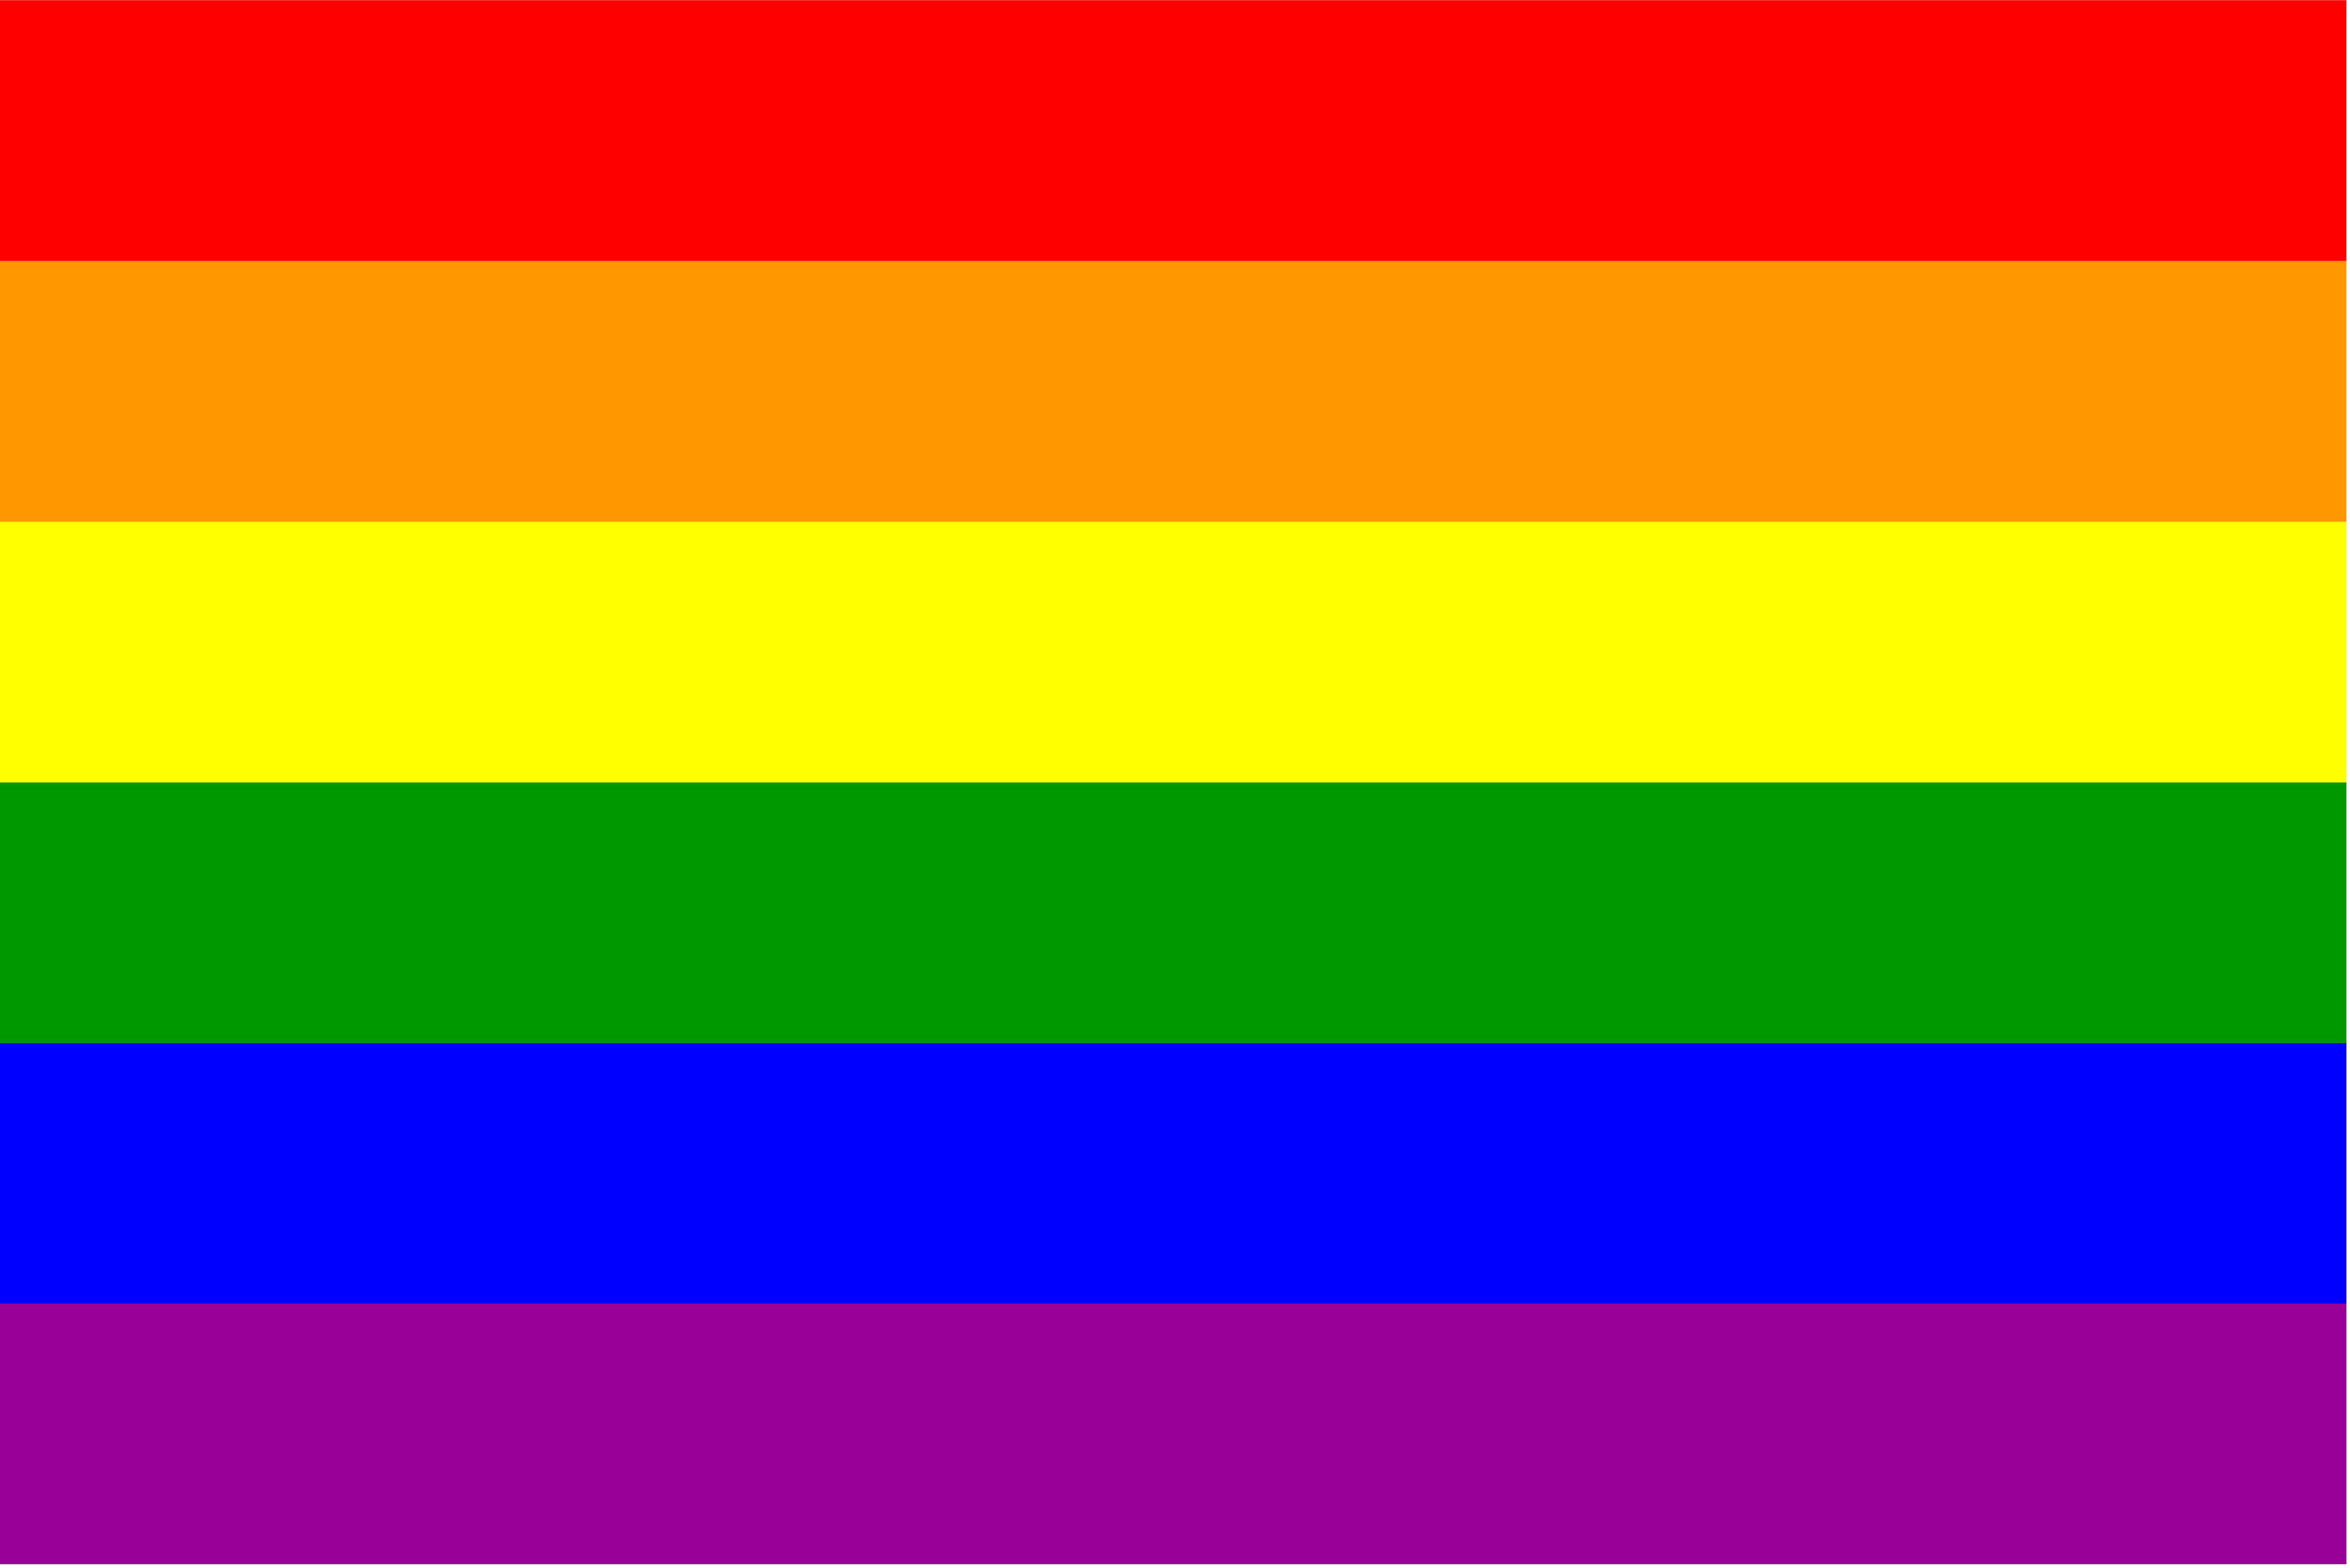 The National Lesbian Gay Bisexual Transgender Bar Association has 3563x2378